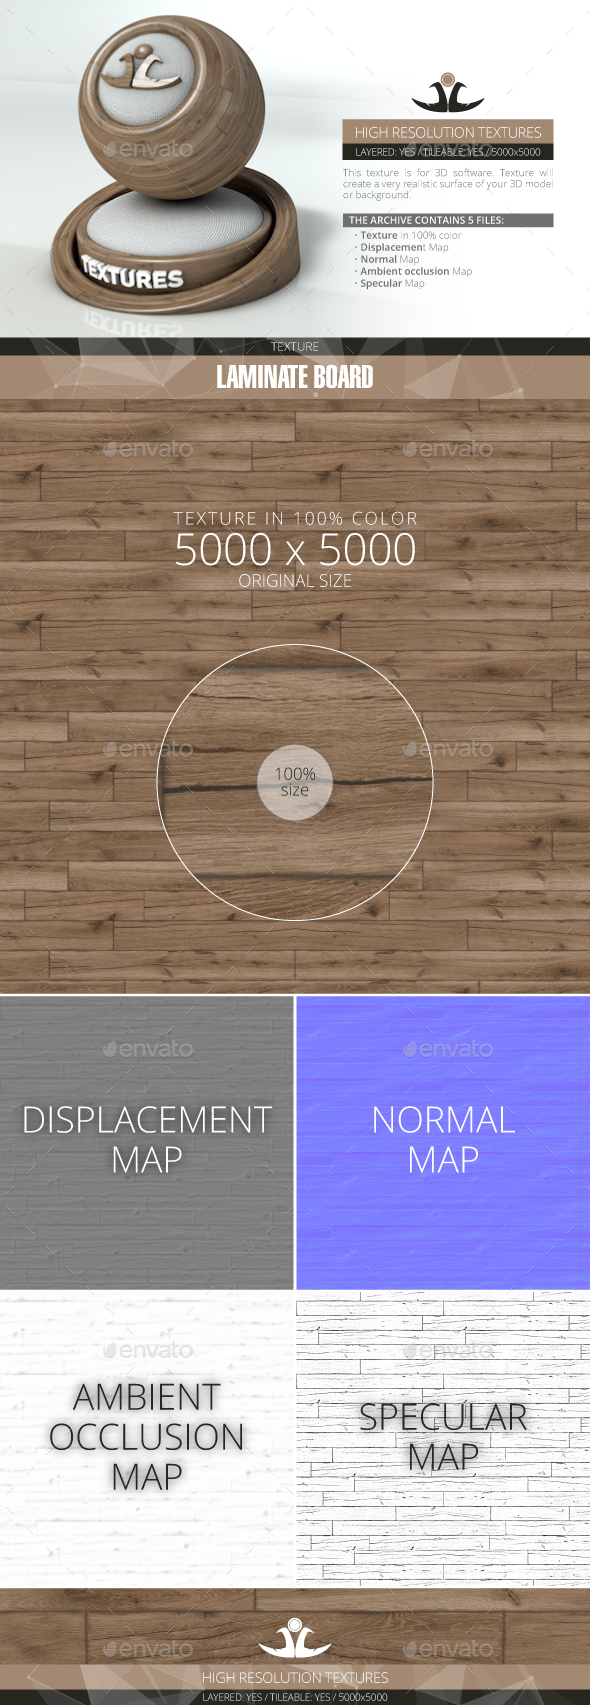 Laminate Board 11 - 3DOcean Item for Sale